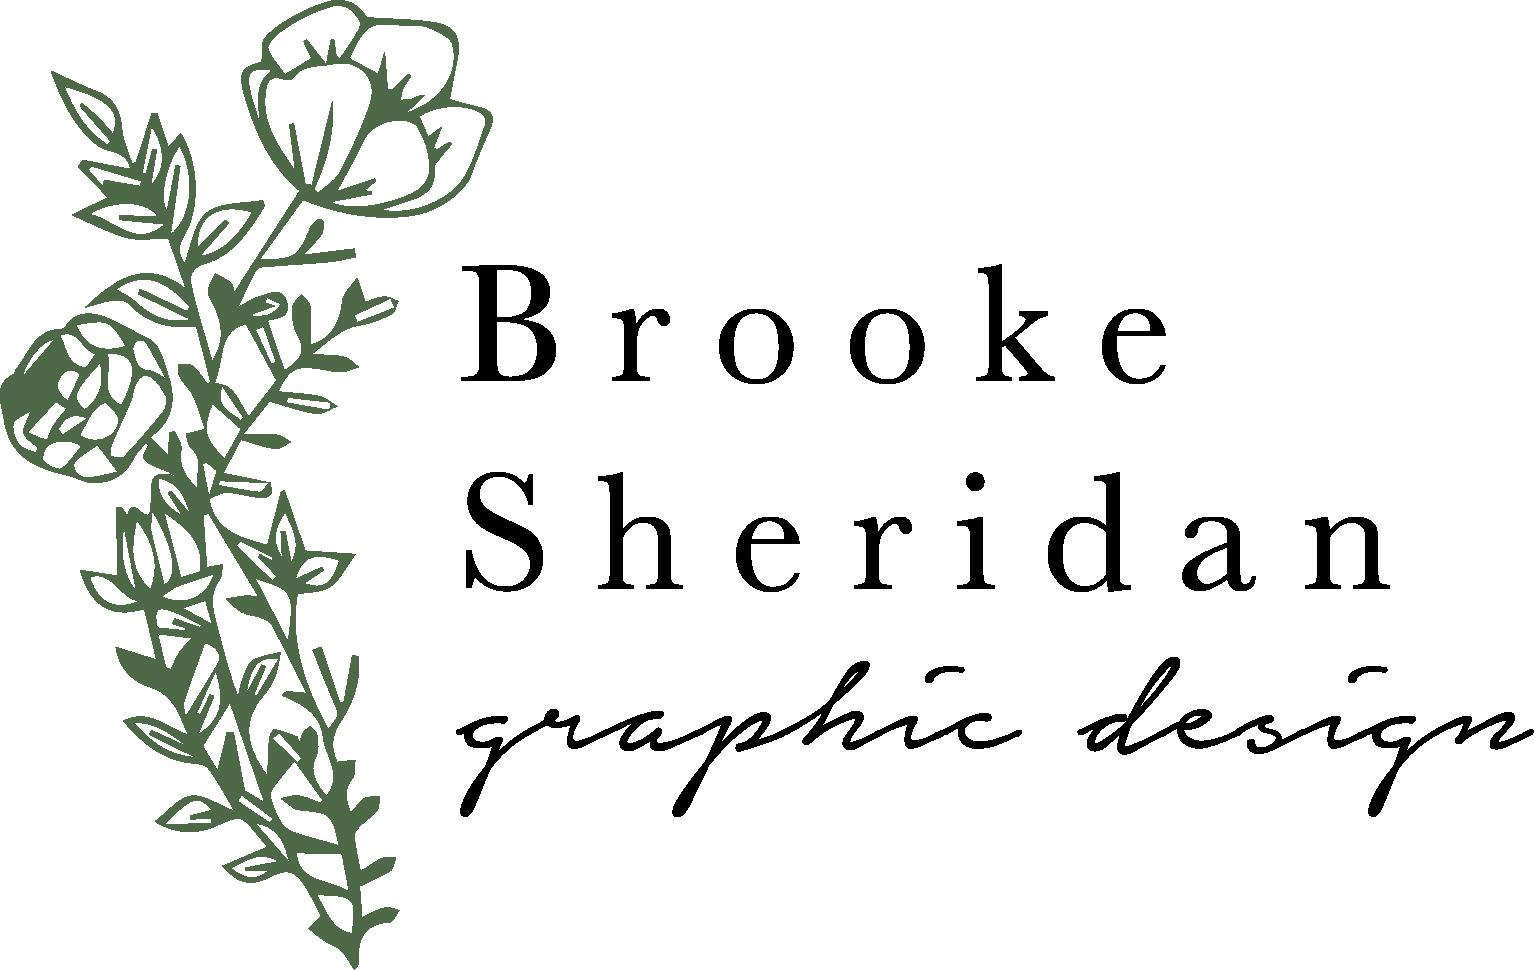 Brooke Sheridan